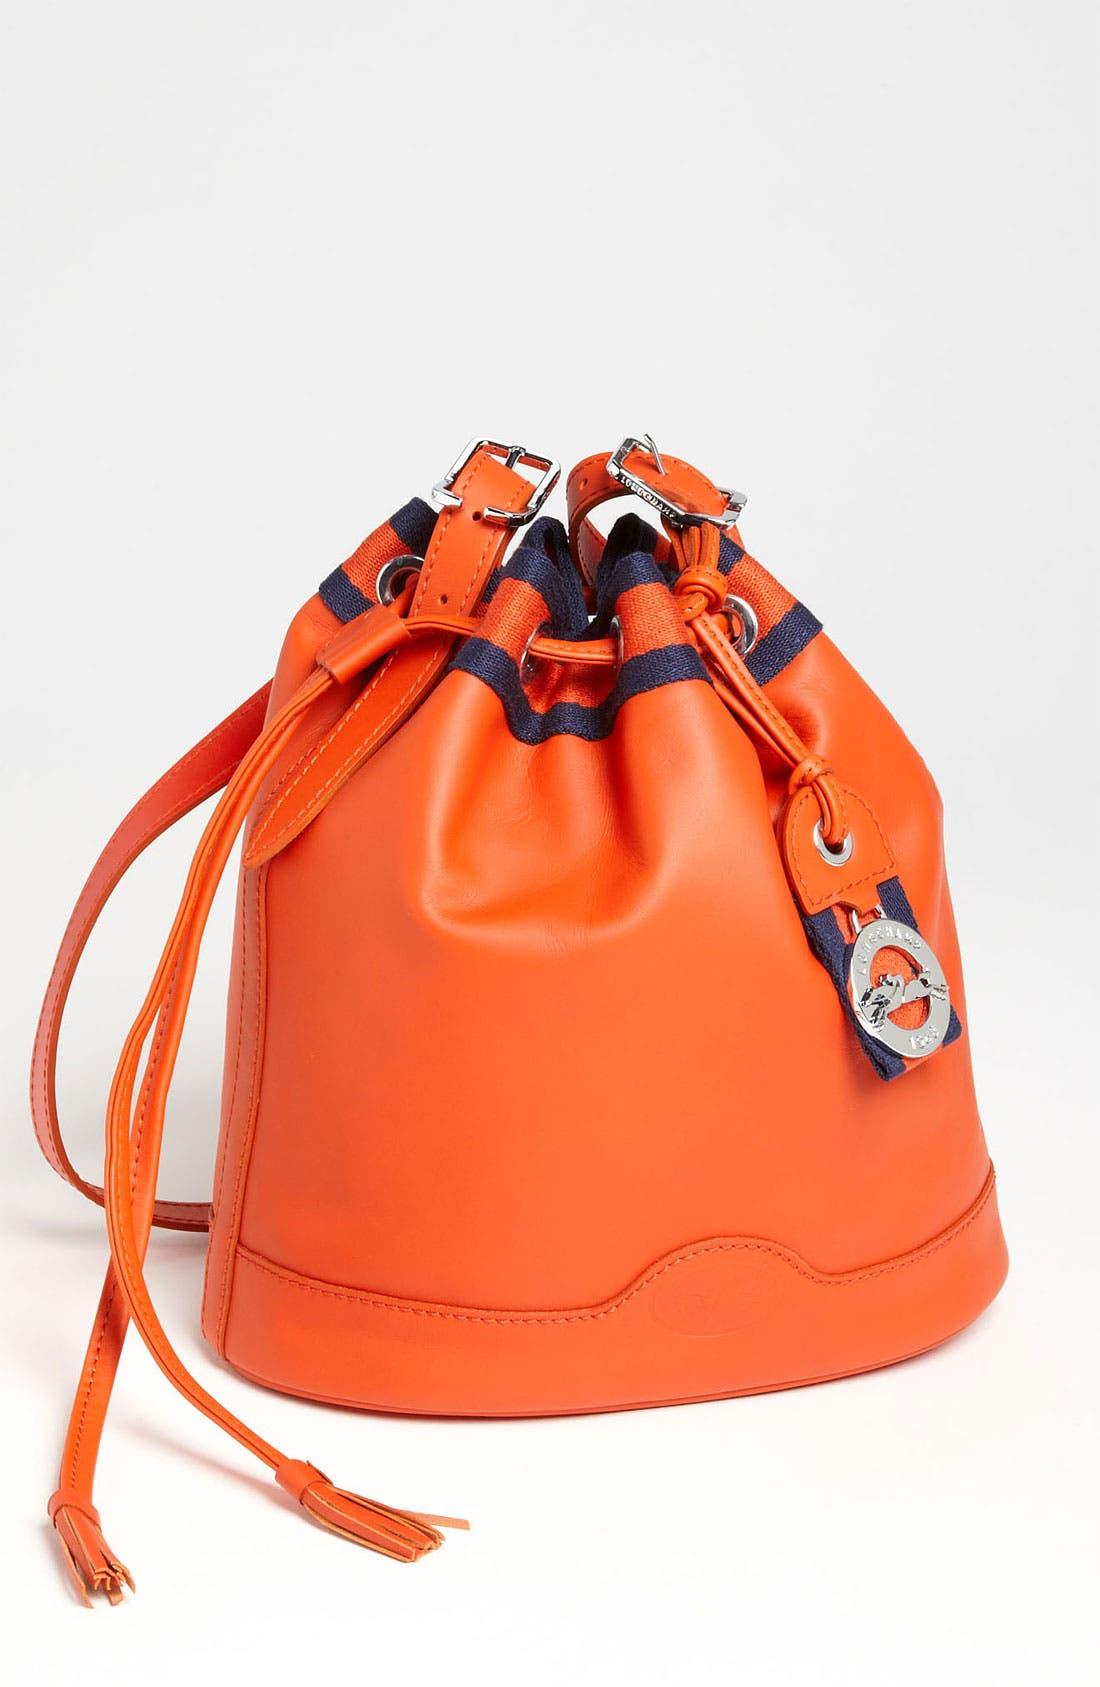 Alternate Image 1 Selected - Longchamp 'Au Sultan' Drawstring Bag